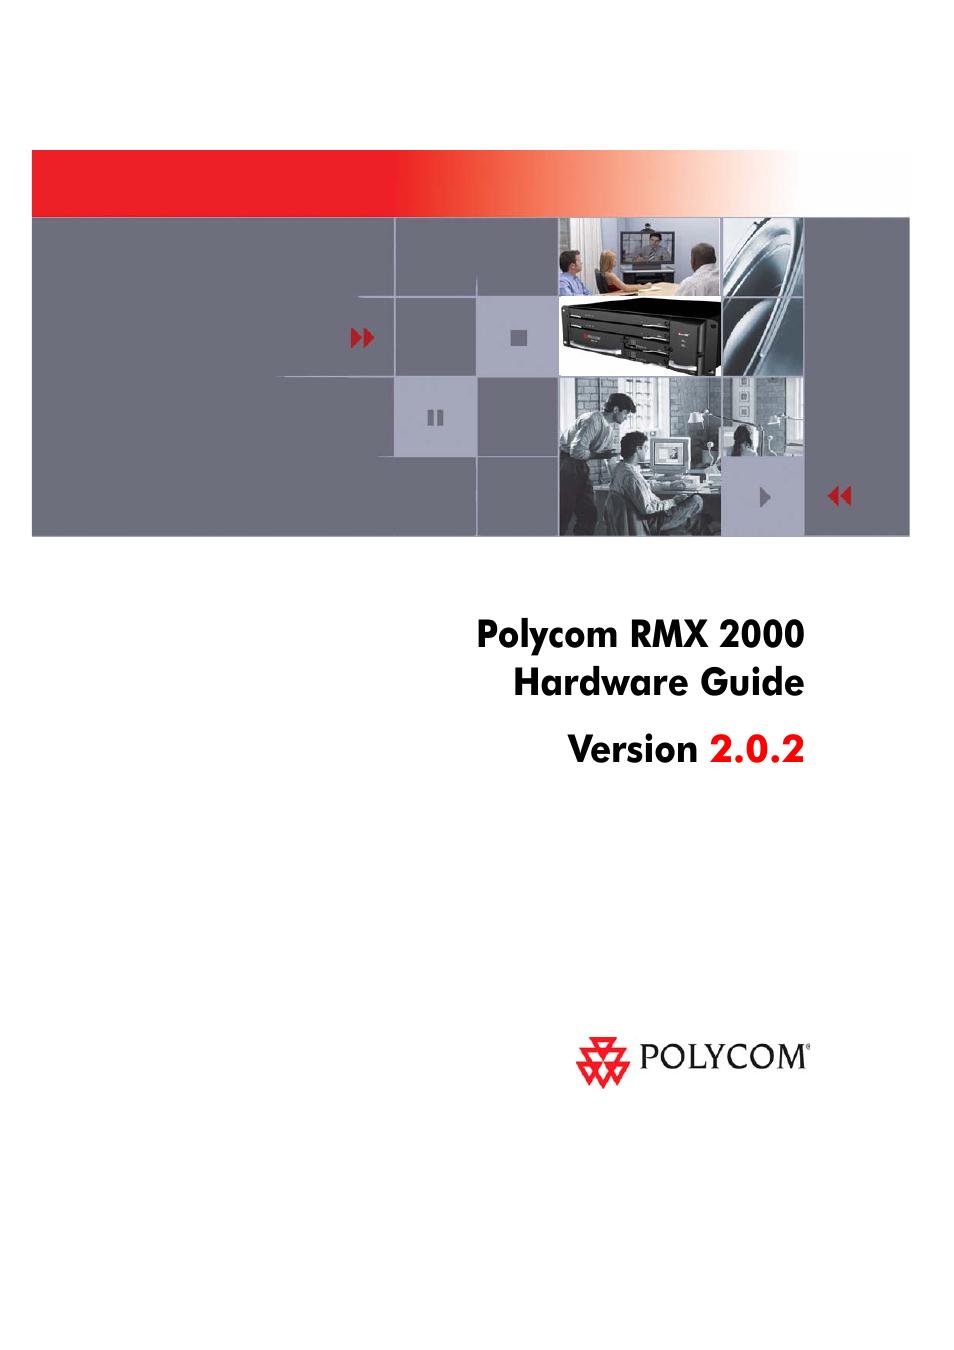 polycom rmx 2000 user manual 32 pages rh manualsdir com Polycom RMX 2000 Polycom RMX 2000